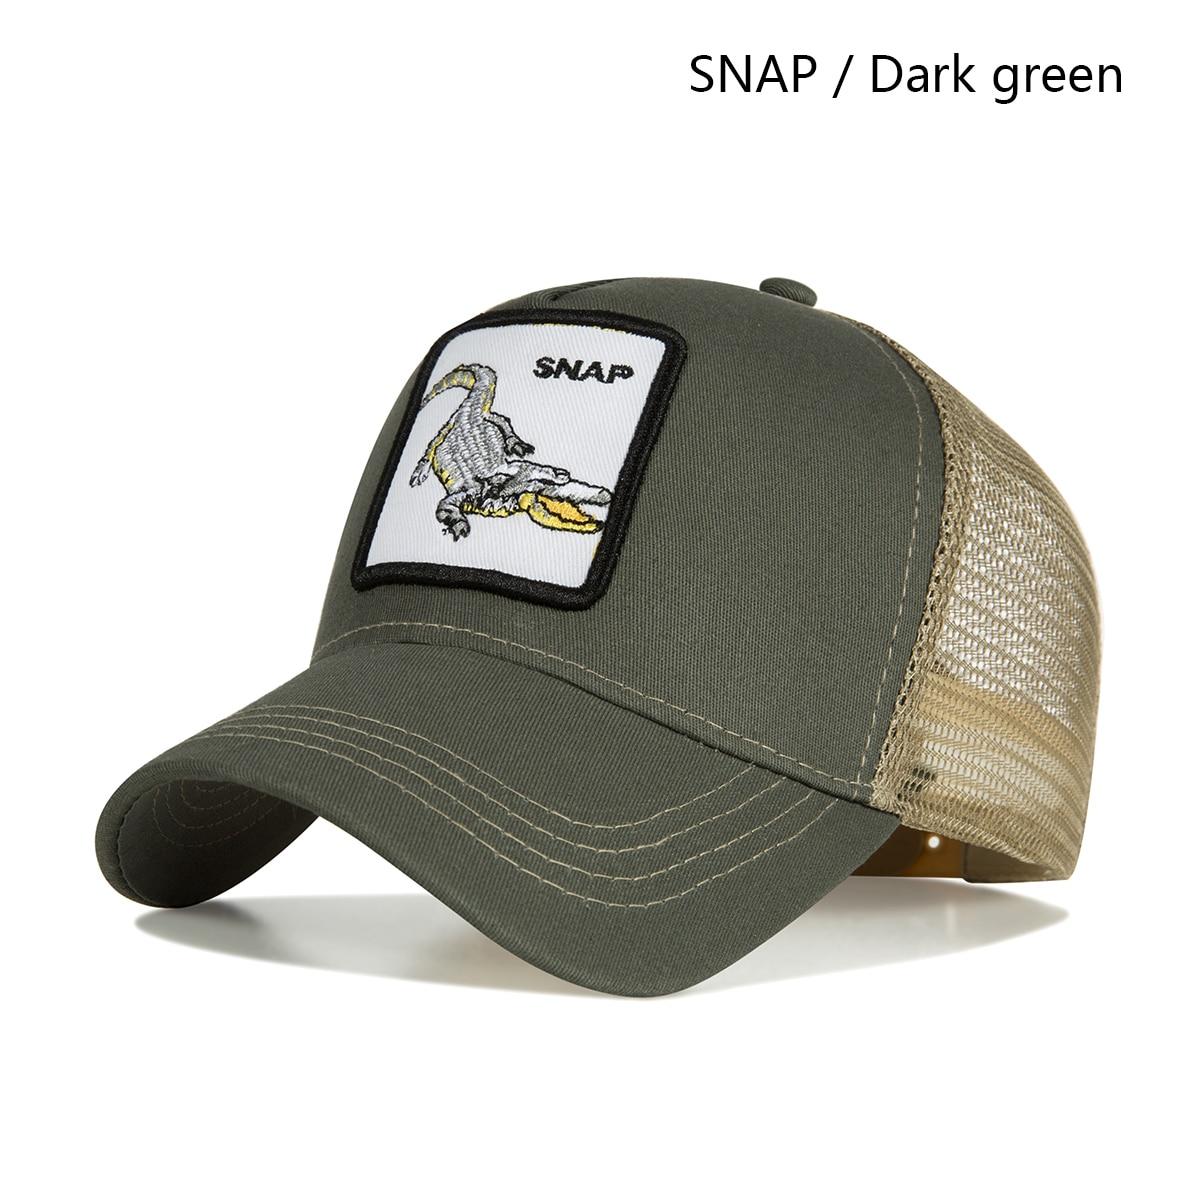 dark green snap